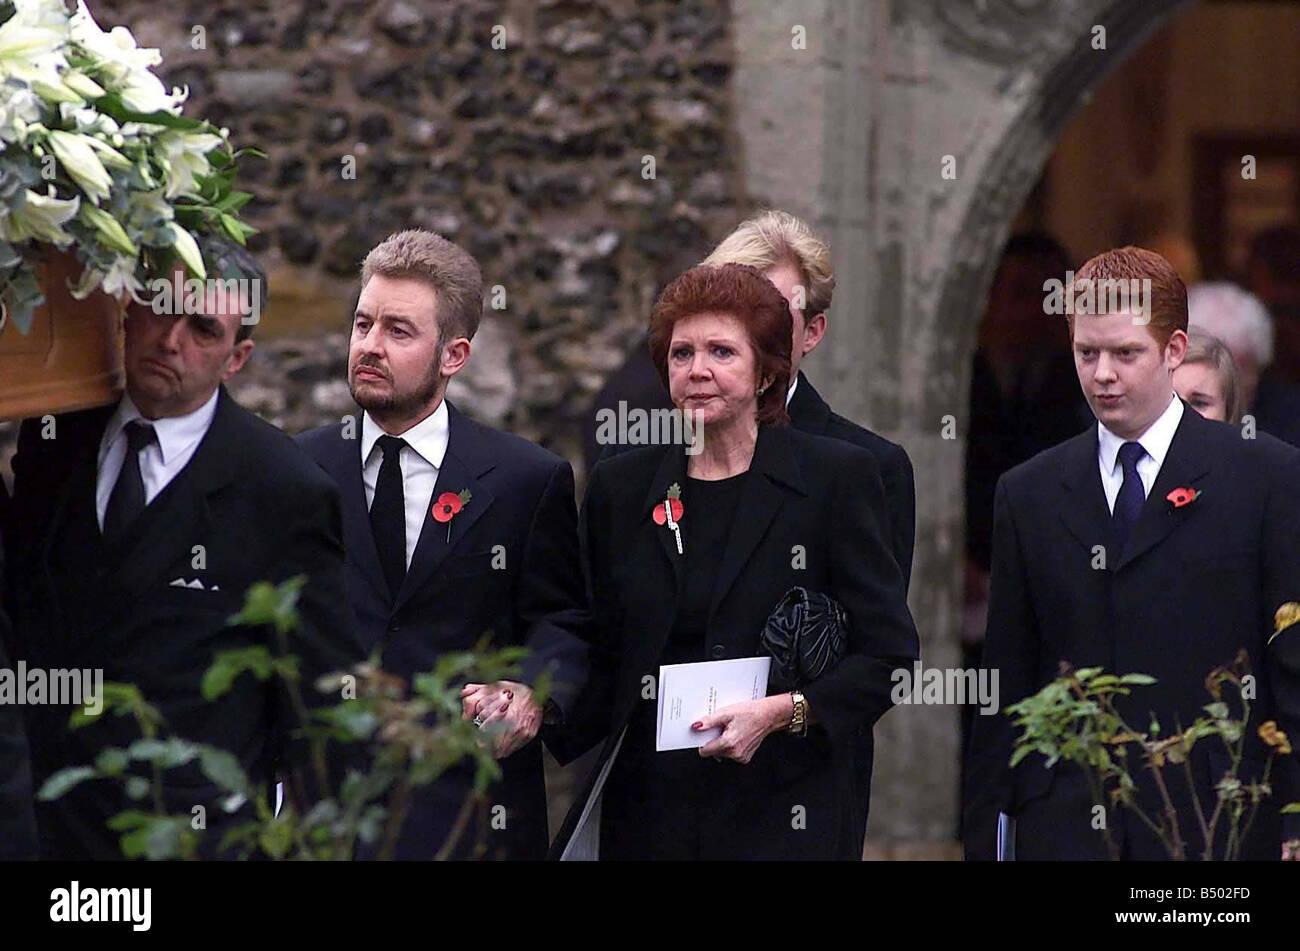 leaving cilla blacks funeral - HD1300×951